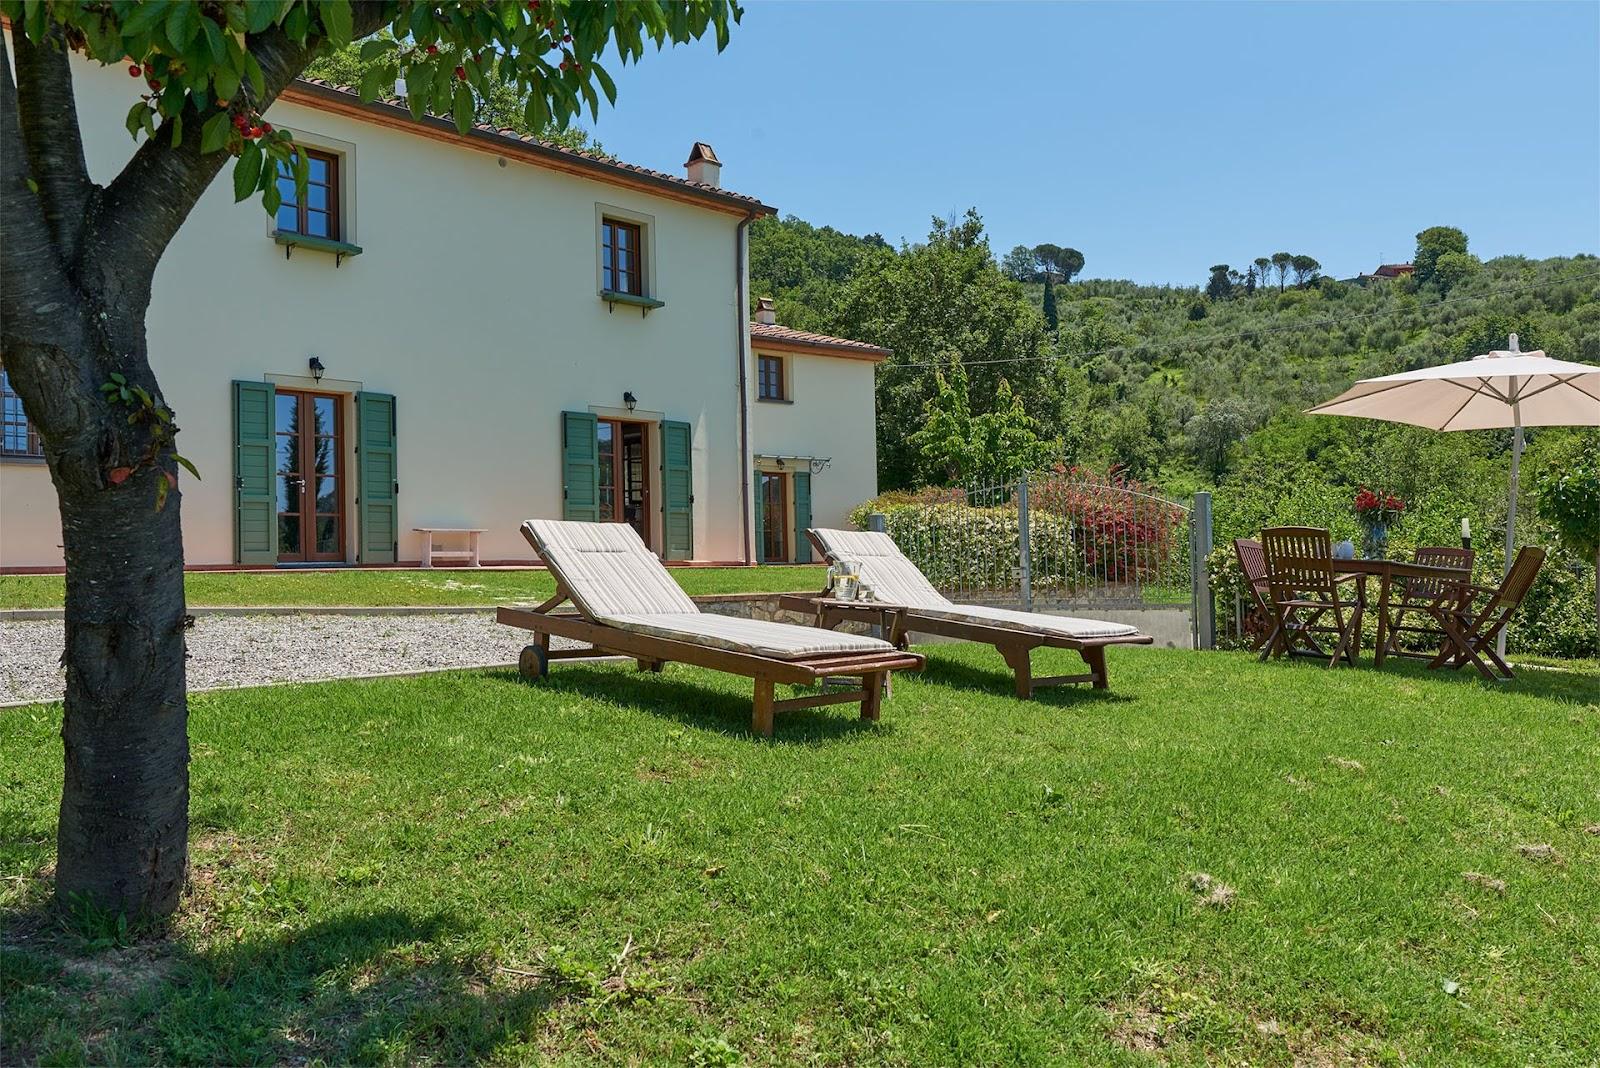 Ferienhaus Corte Paradiso (2570342), Monsummano Terme, Pistoia, Toskana, Italien, Bild 8